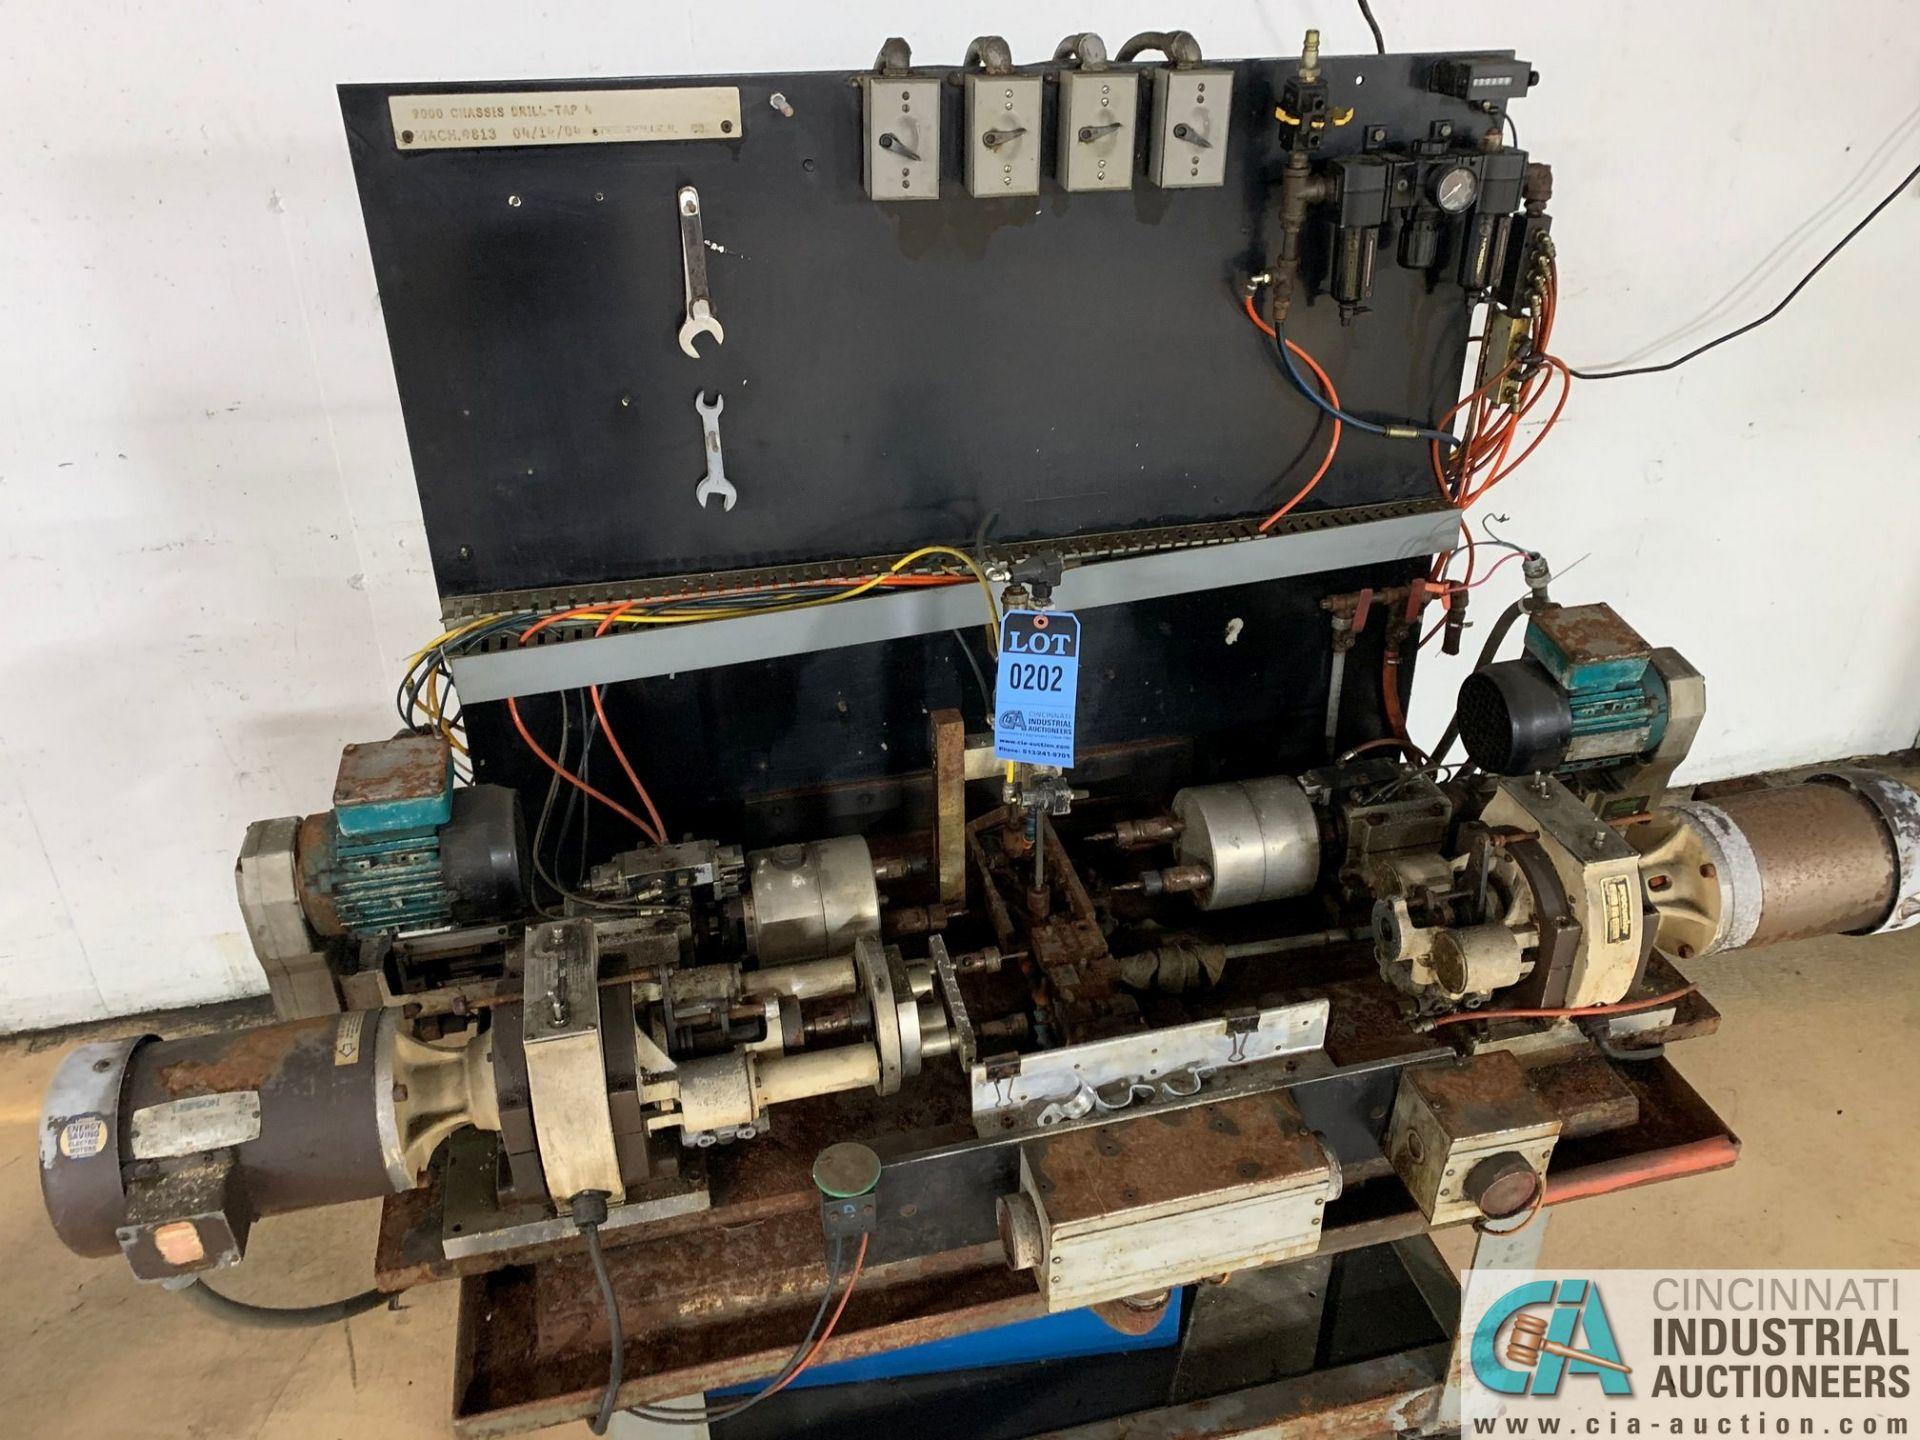 8-SPINDLE HORIZONTAL DRILLING MACHINE - Image 2 of 4